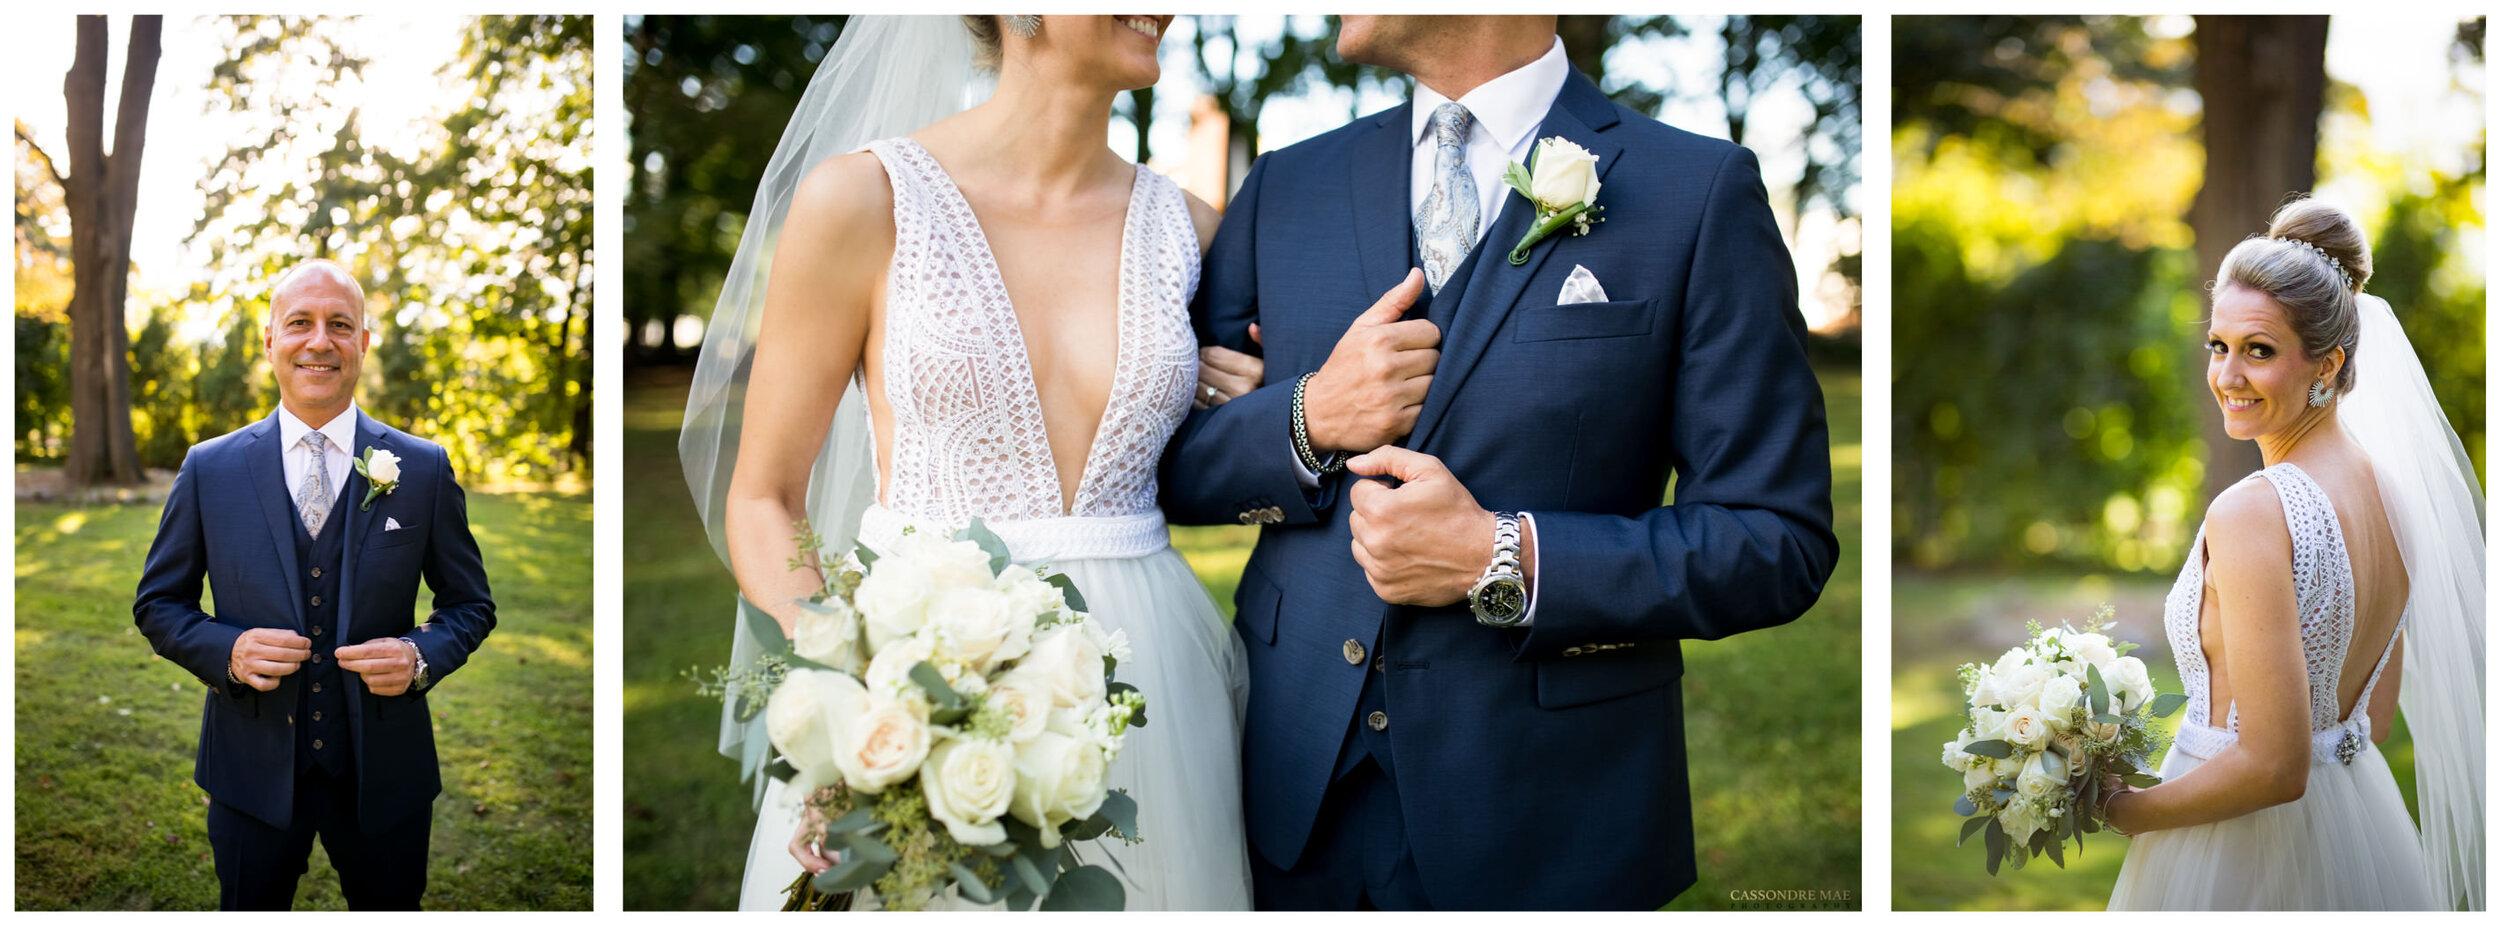 Cassondre Mae Photography Briarcliff Manor Wedding Photographer 21.jpg